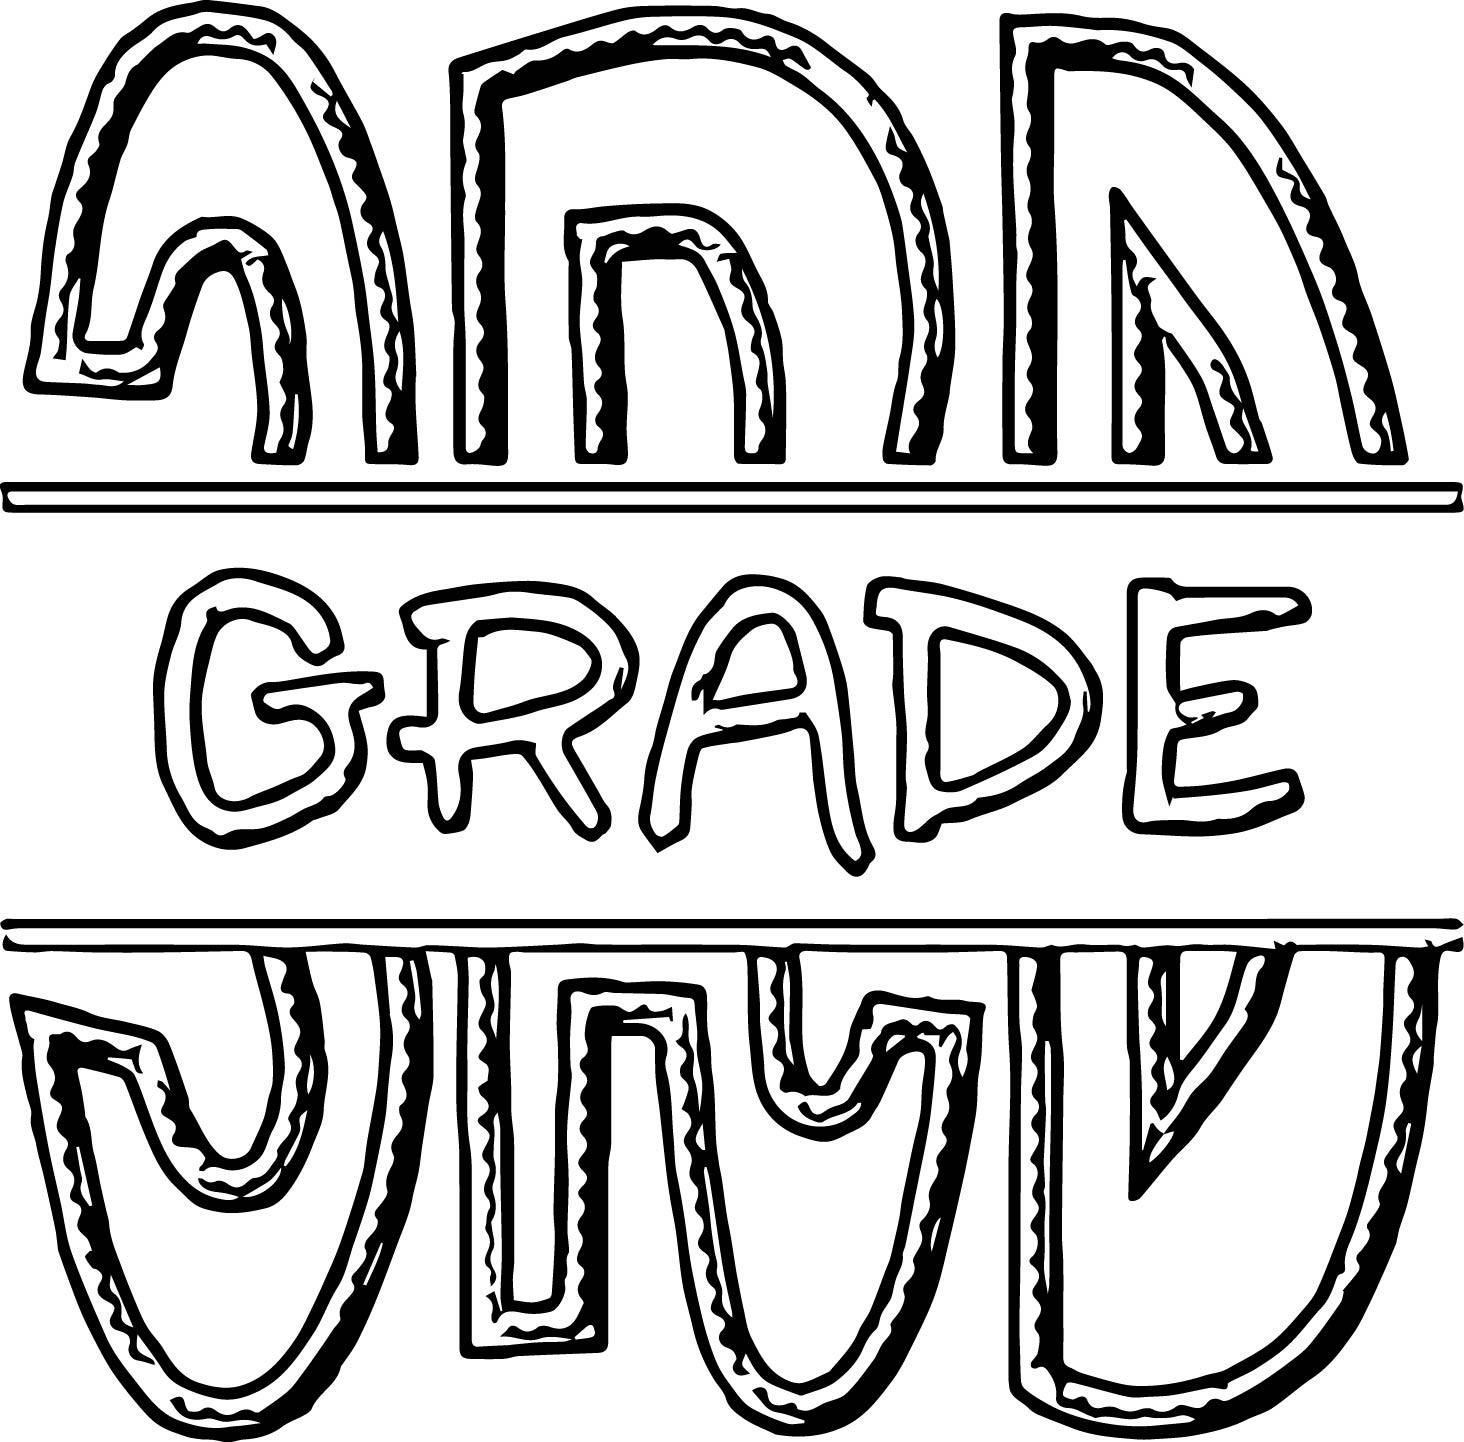 FSF Split 3rd Grade 3rd Grade Coloring Page